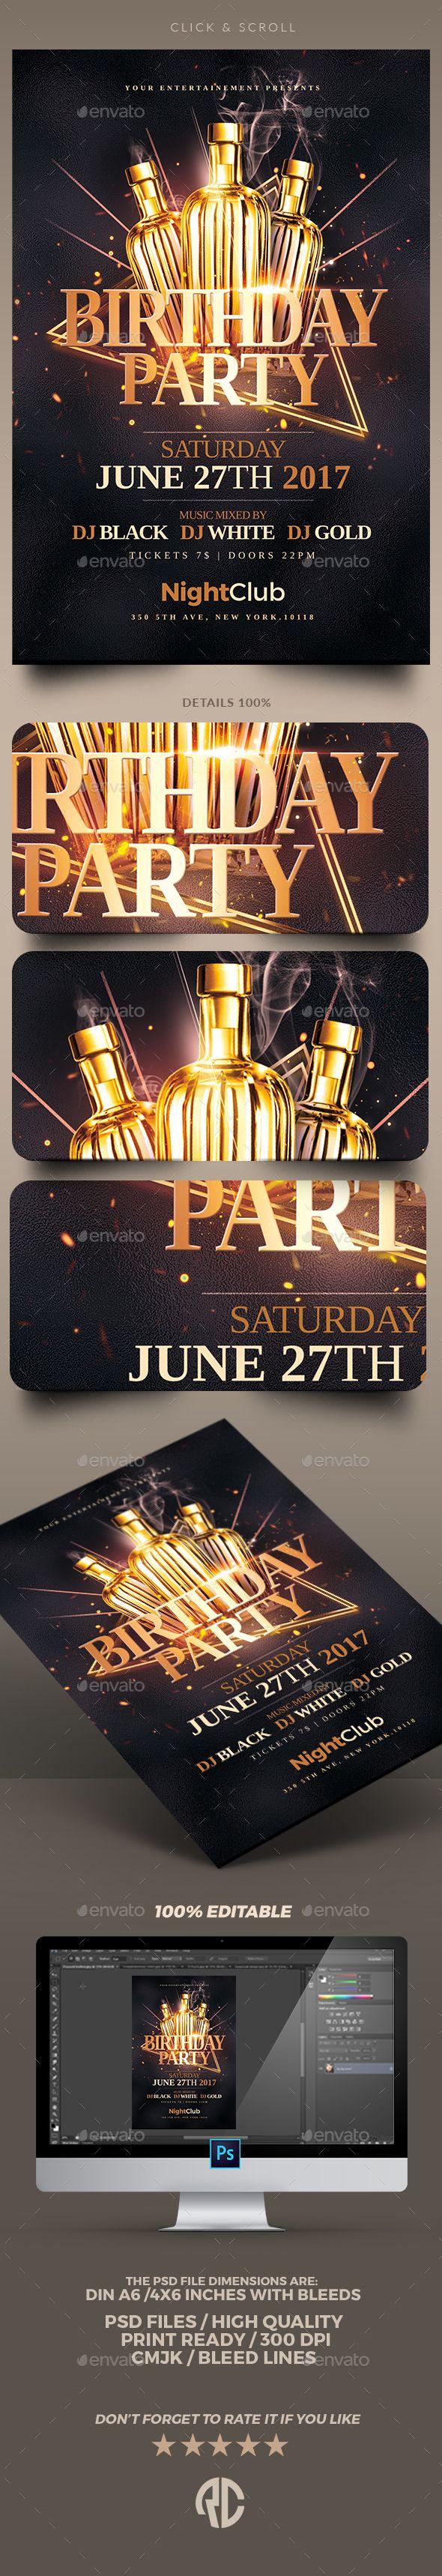 Classy Birthday Party | Flyer Templates PSD